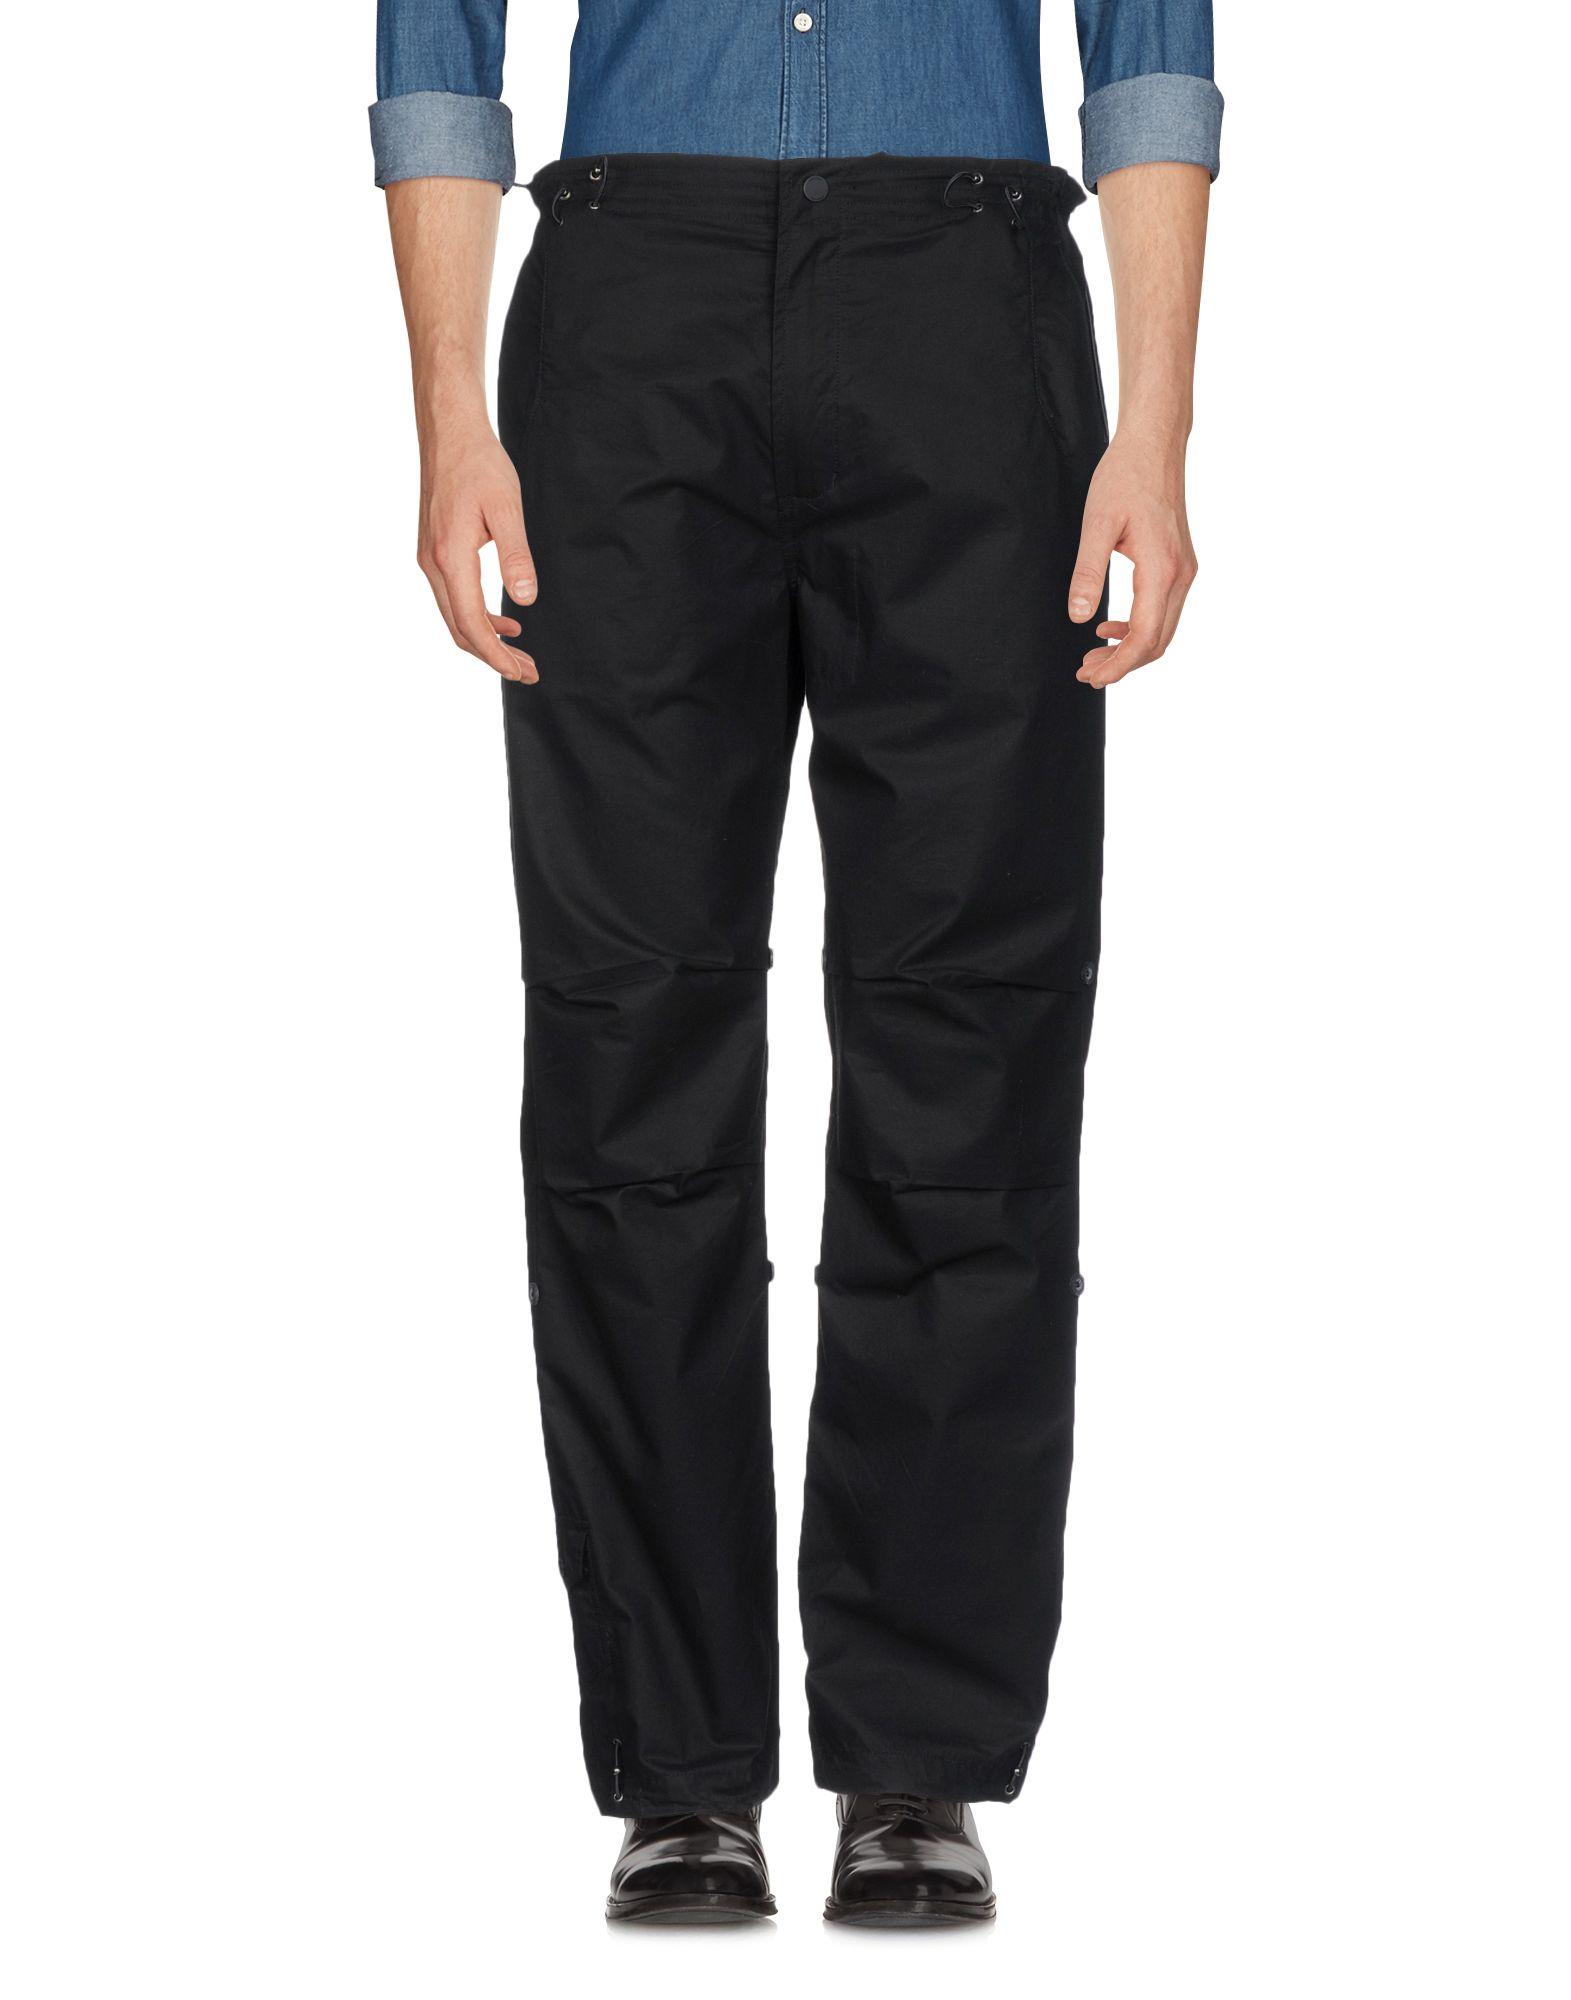 Pantalone Maharishi Uomo - Acquista online su